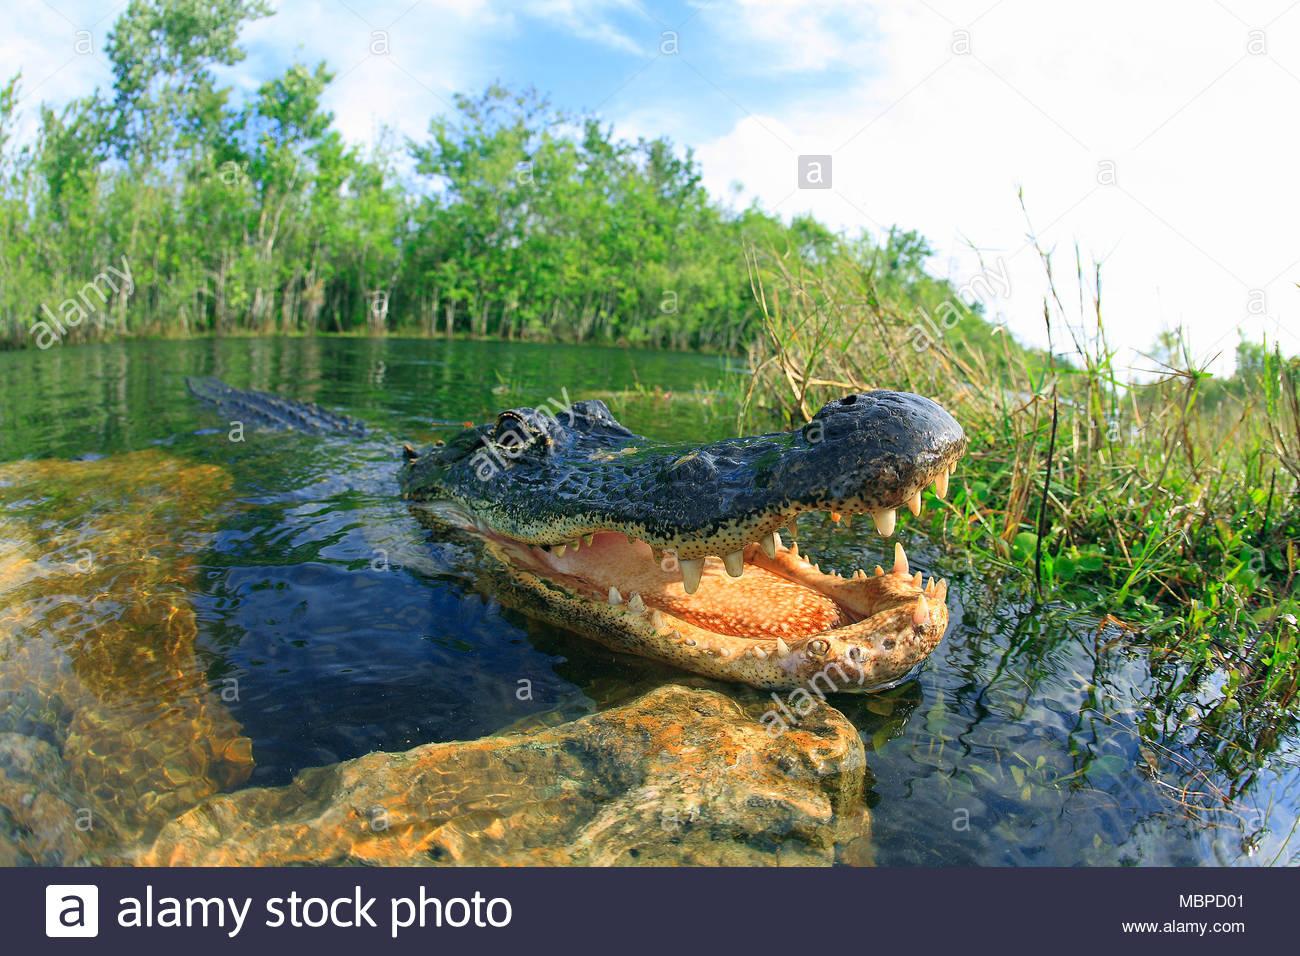 Mississippi alligator (Alligator mississippiensis) also known as American alligator, mouth open, Everglades, Florida, USA Stock Photo